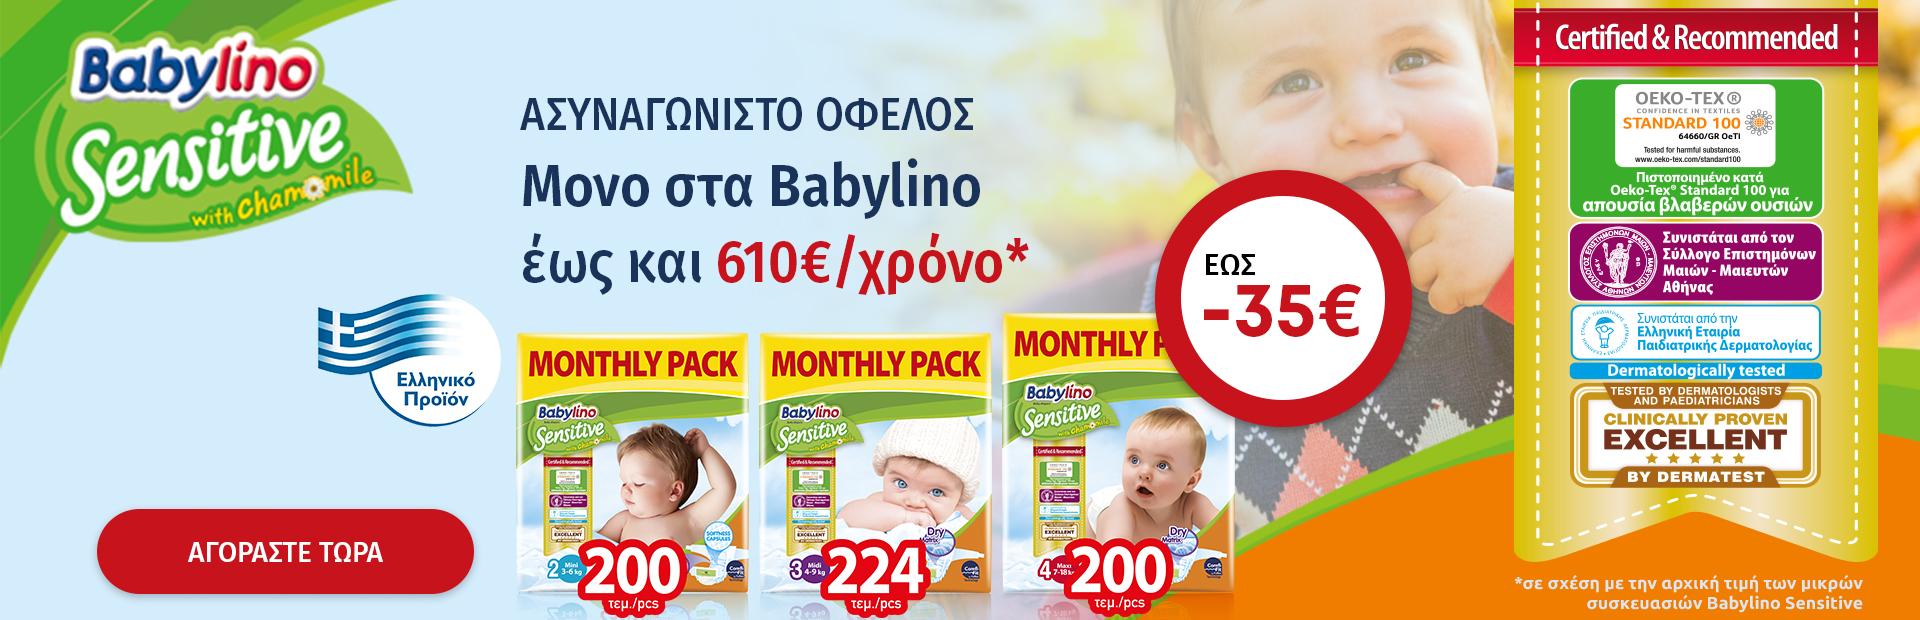 Babylino Monthly Yearly